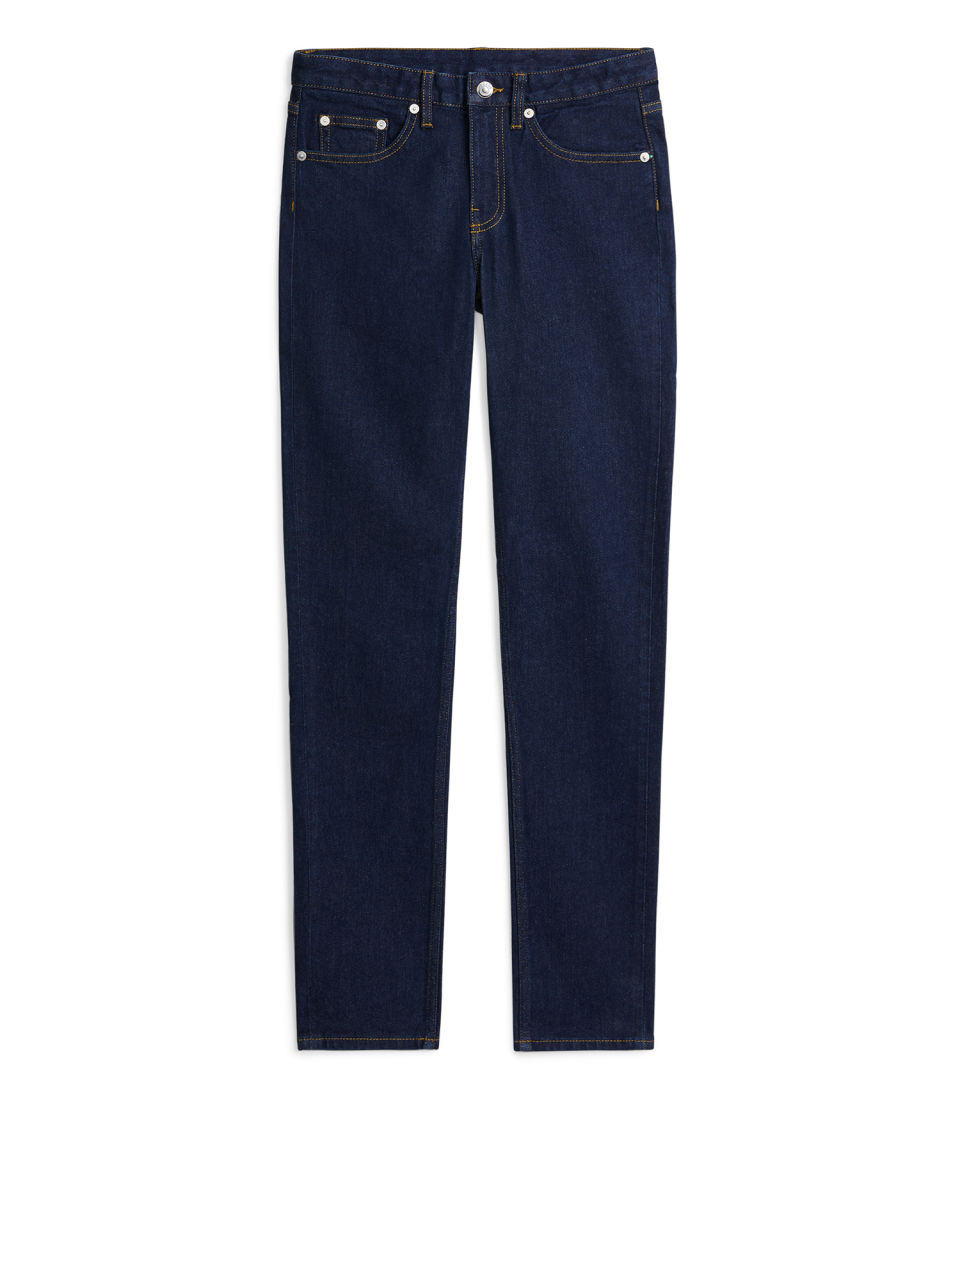 SLIM Rinsed Stretch Jeans - Blue